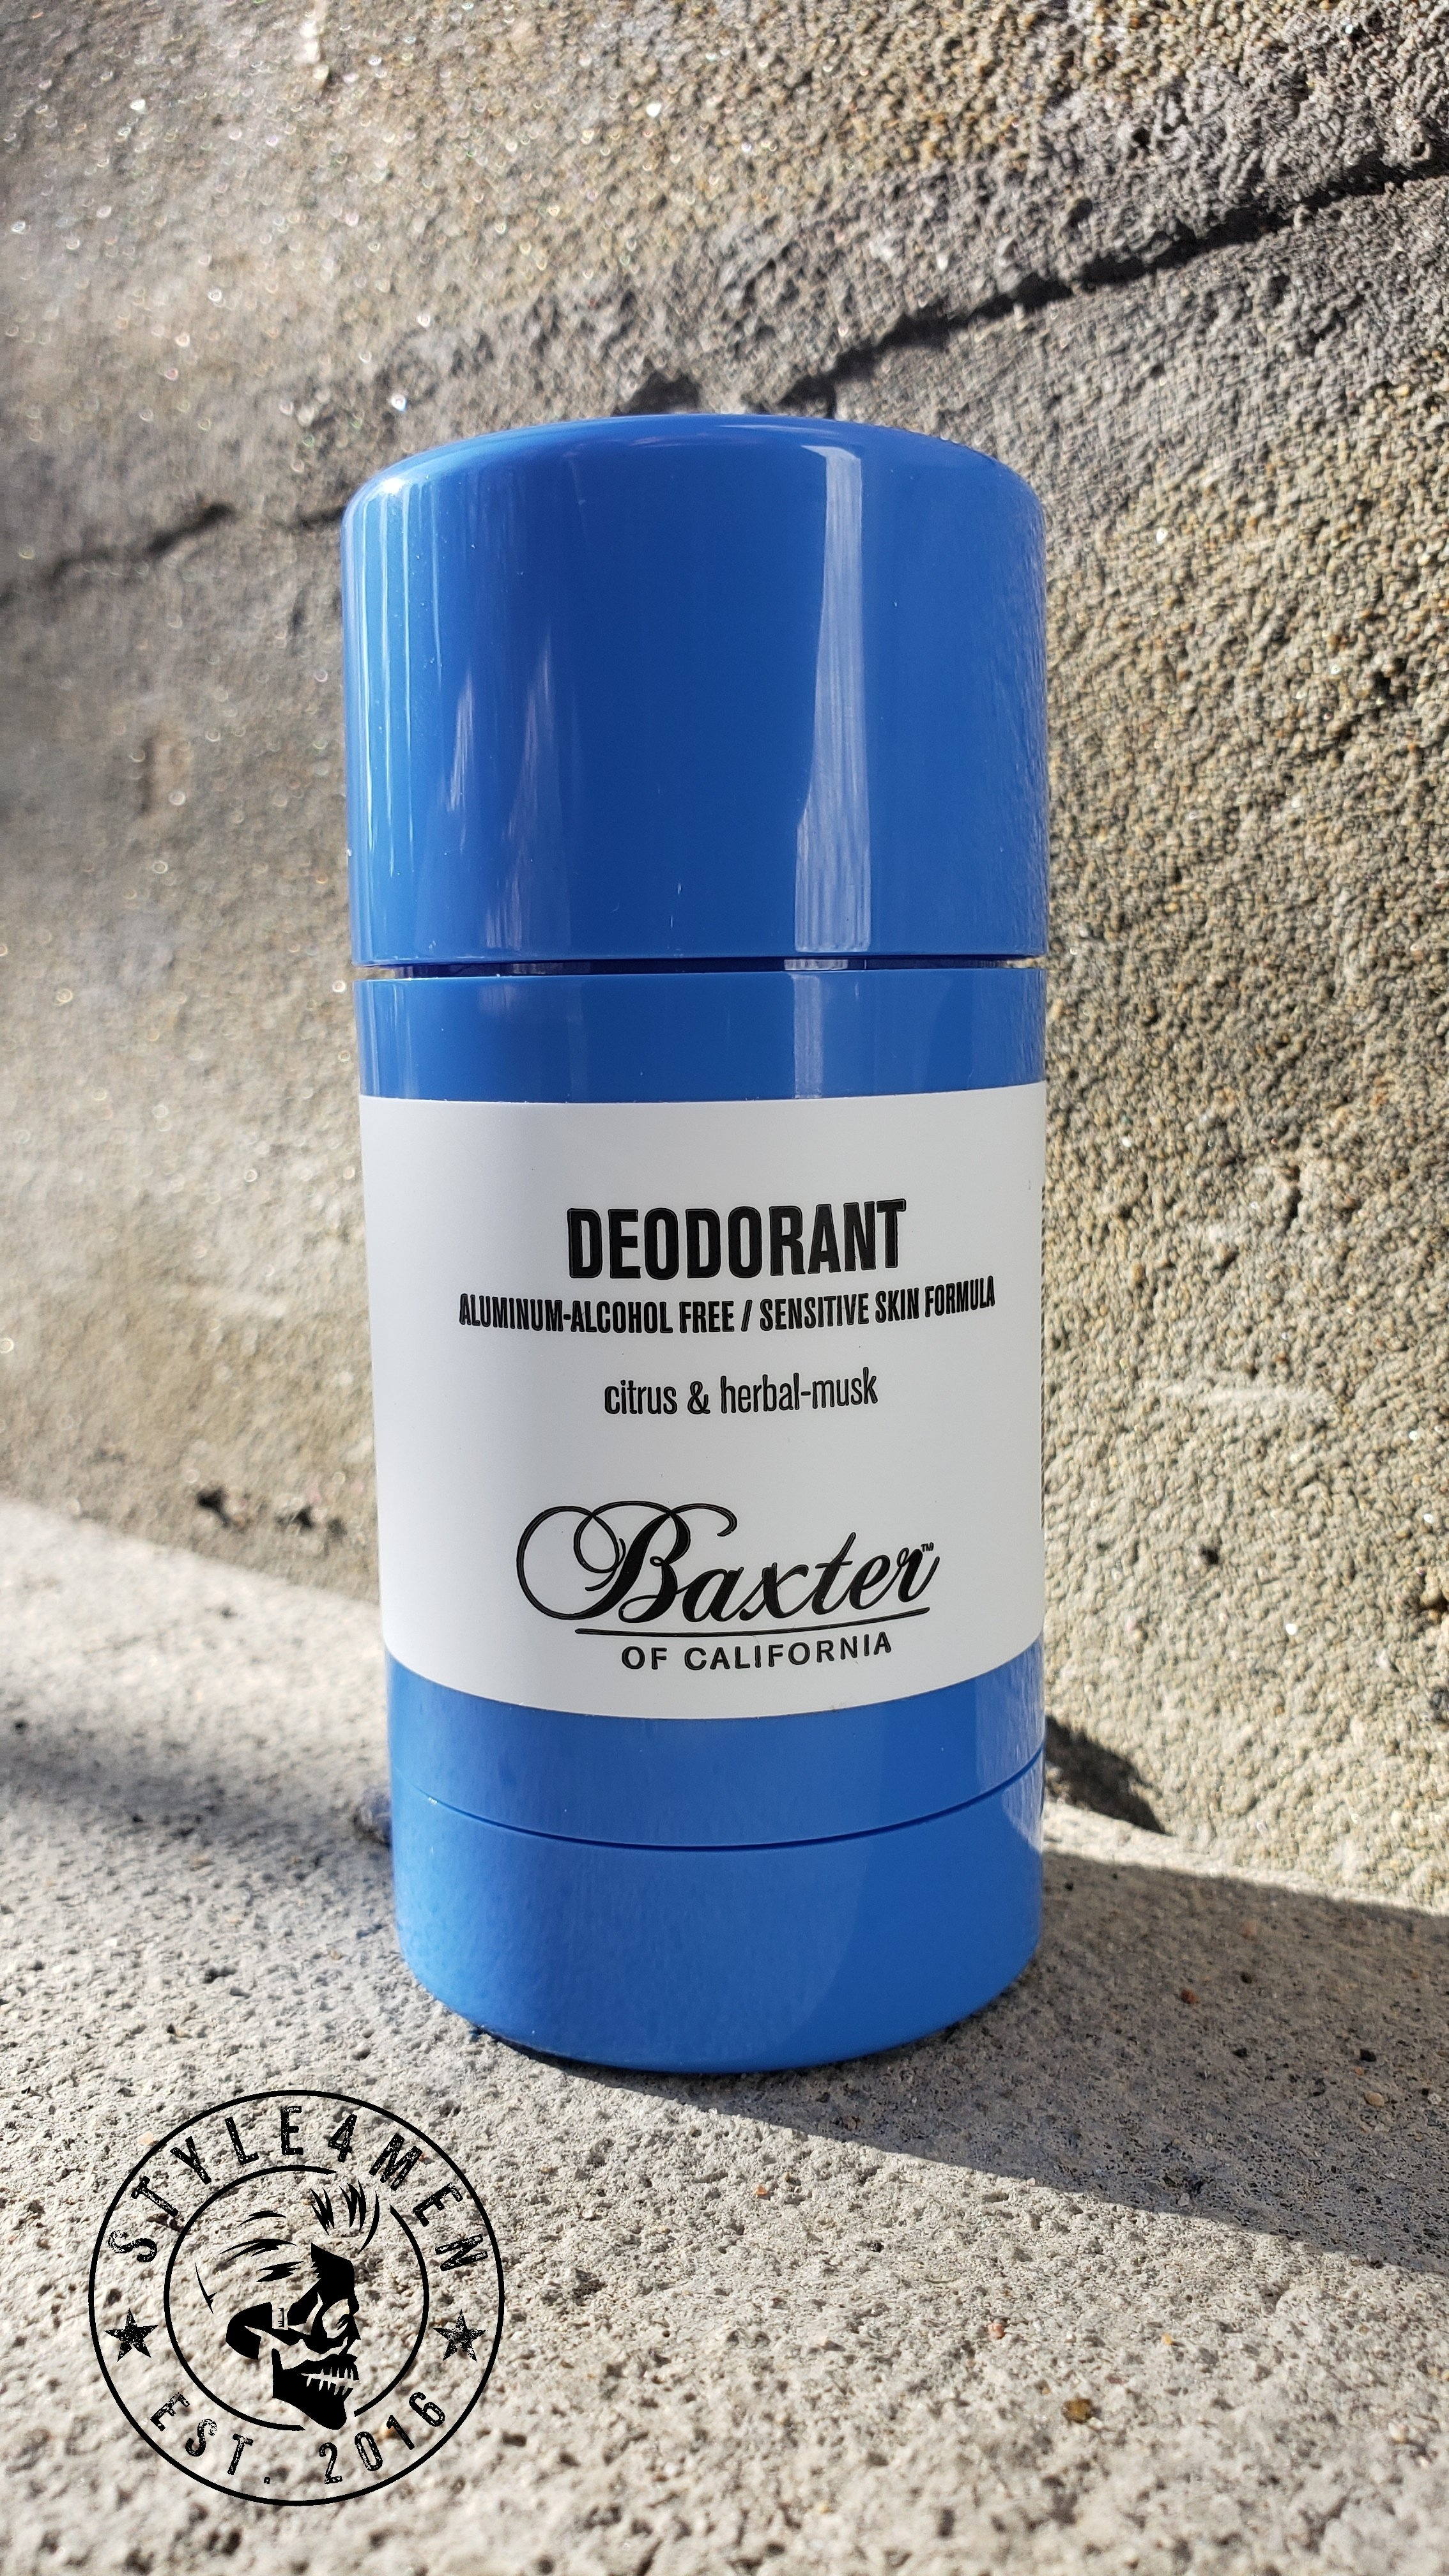 Baxter of California – Deodorant